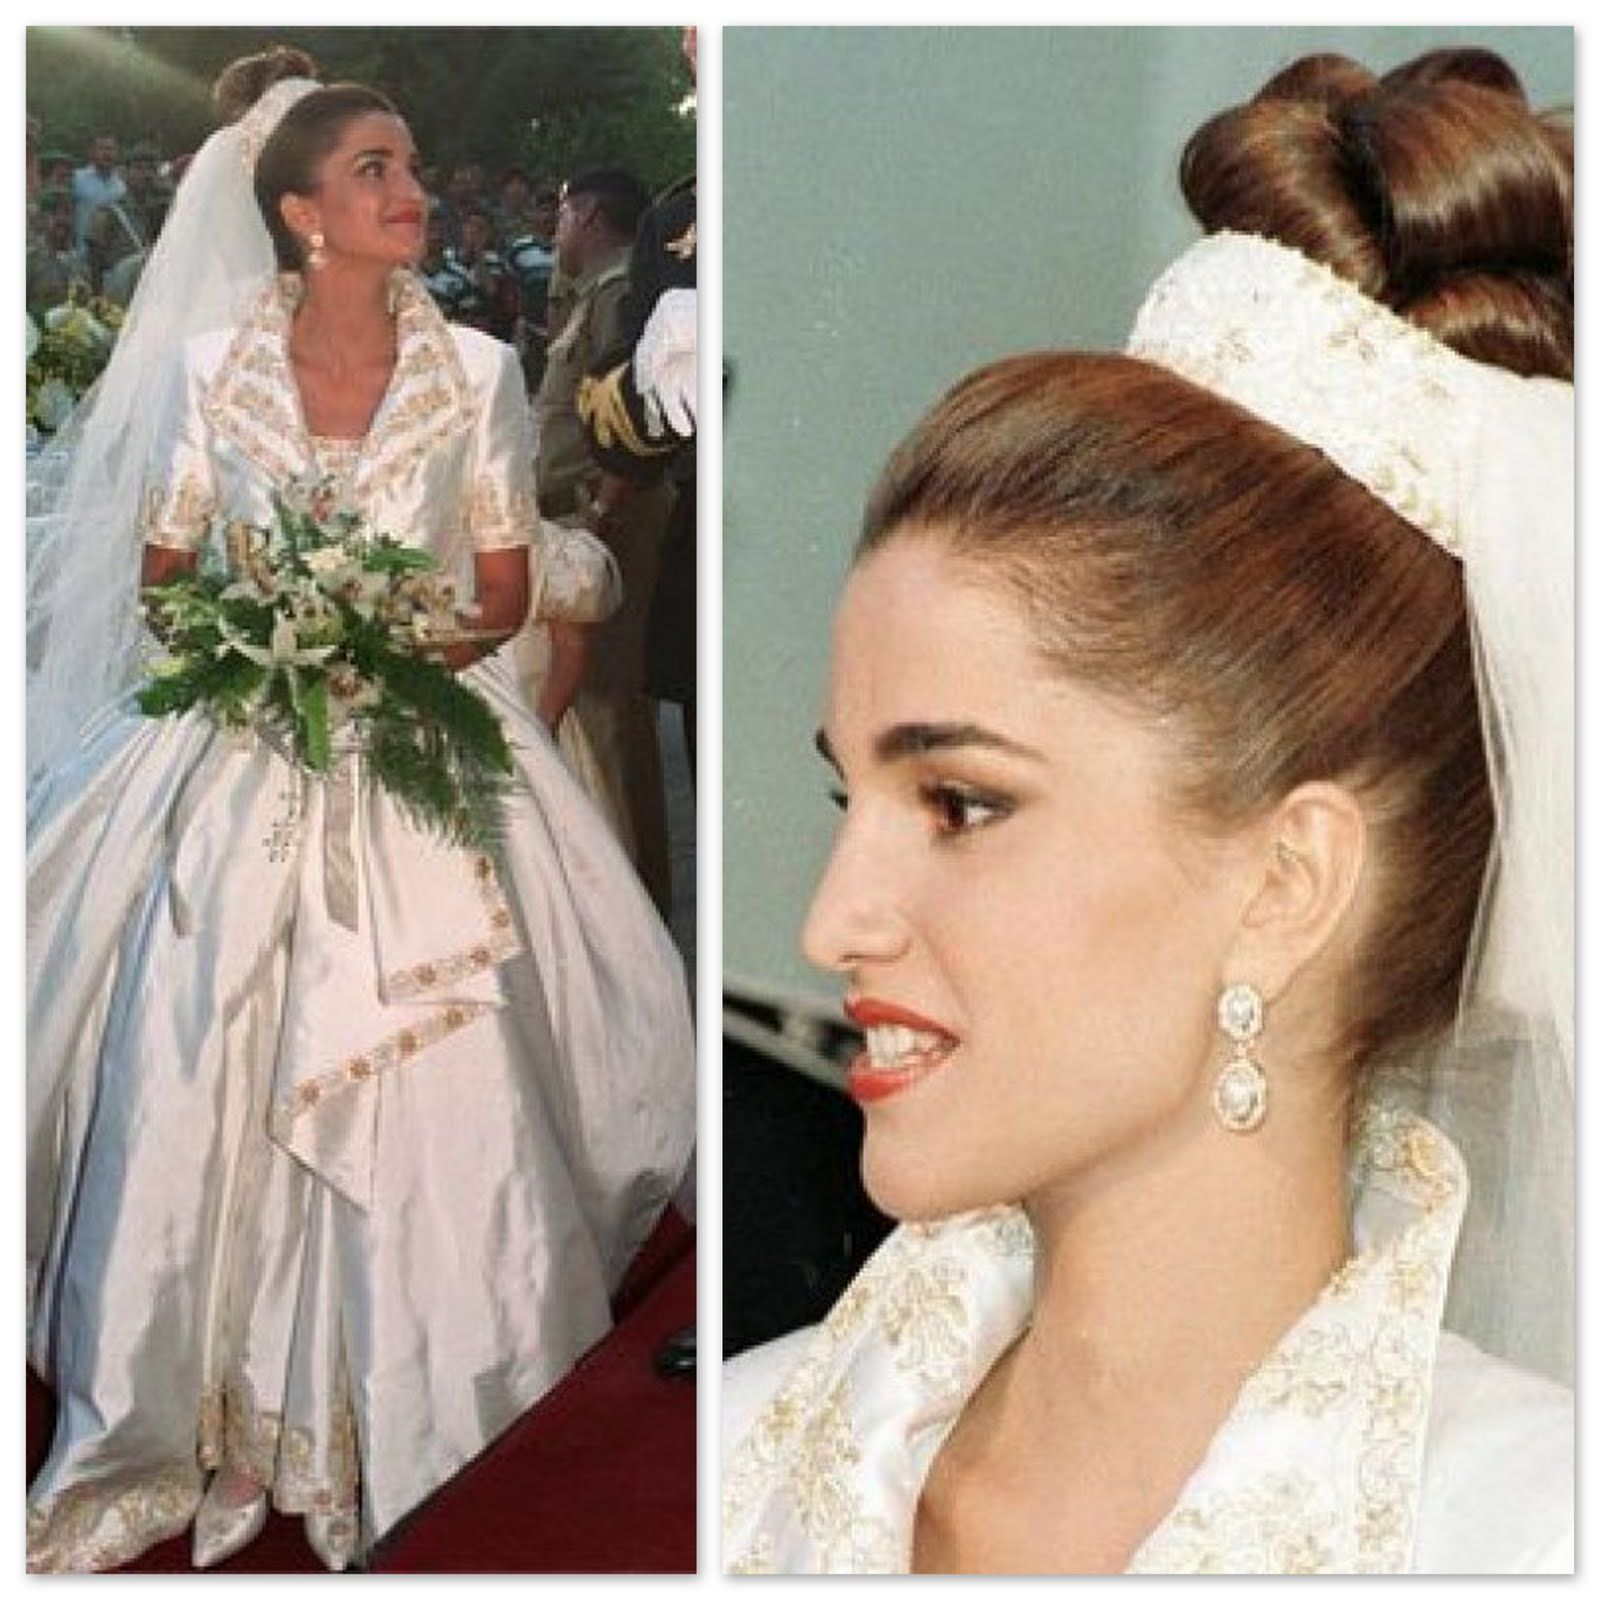 queen rania - Google-søgning | Royal wedding dresses | Pinterest ...